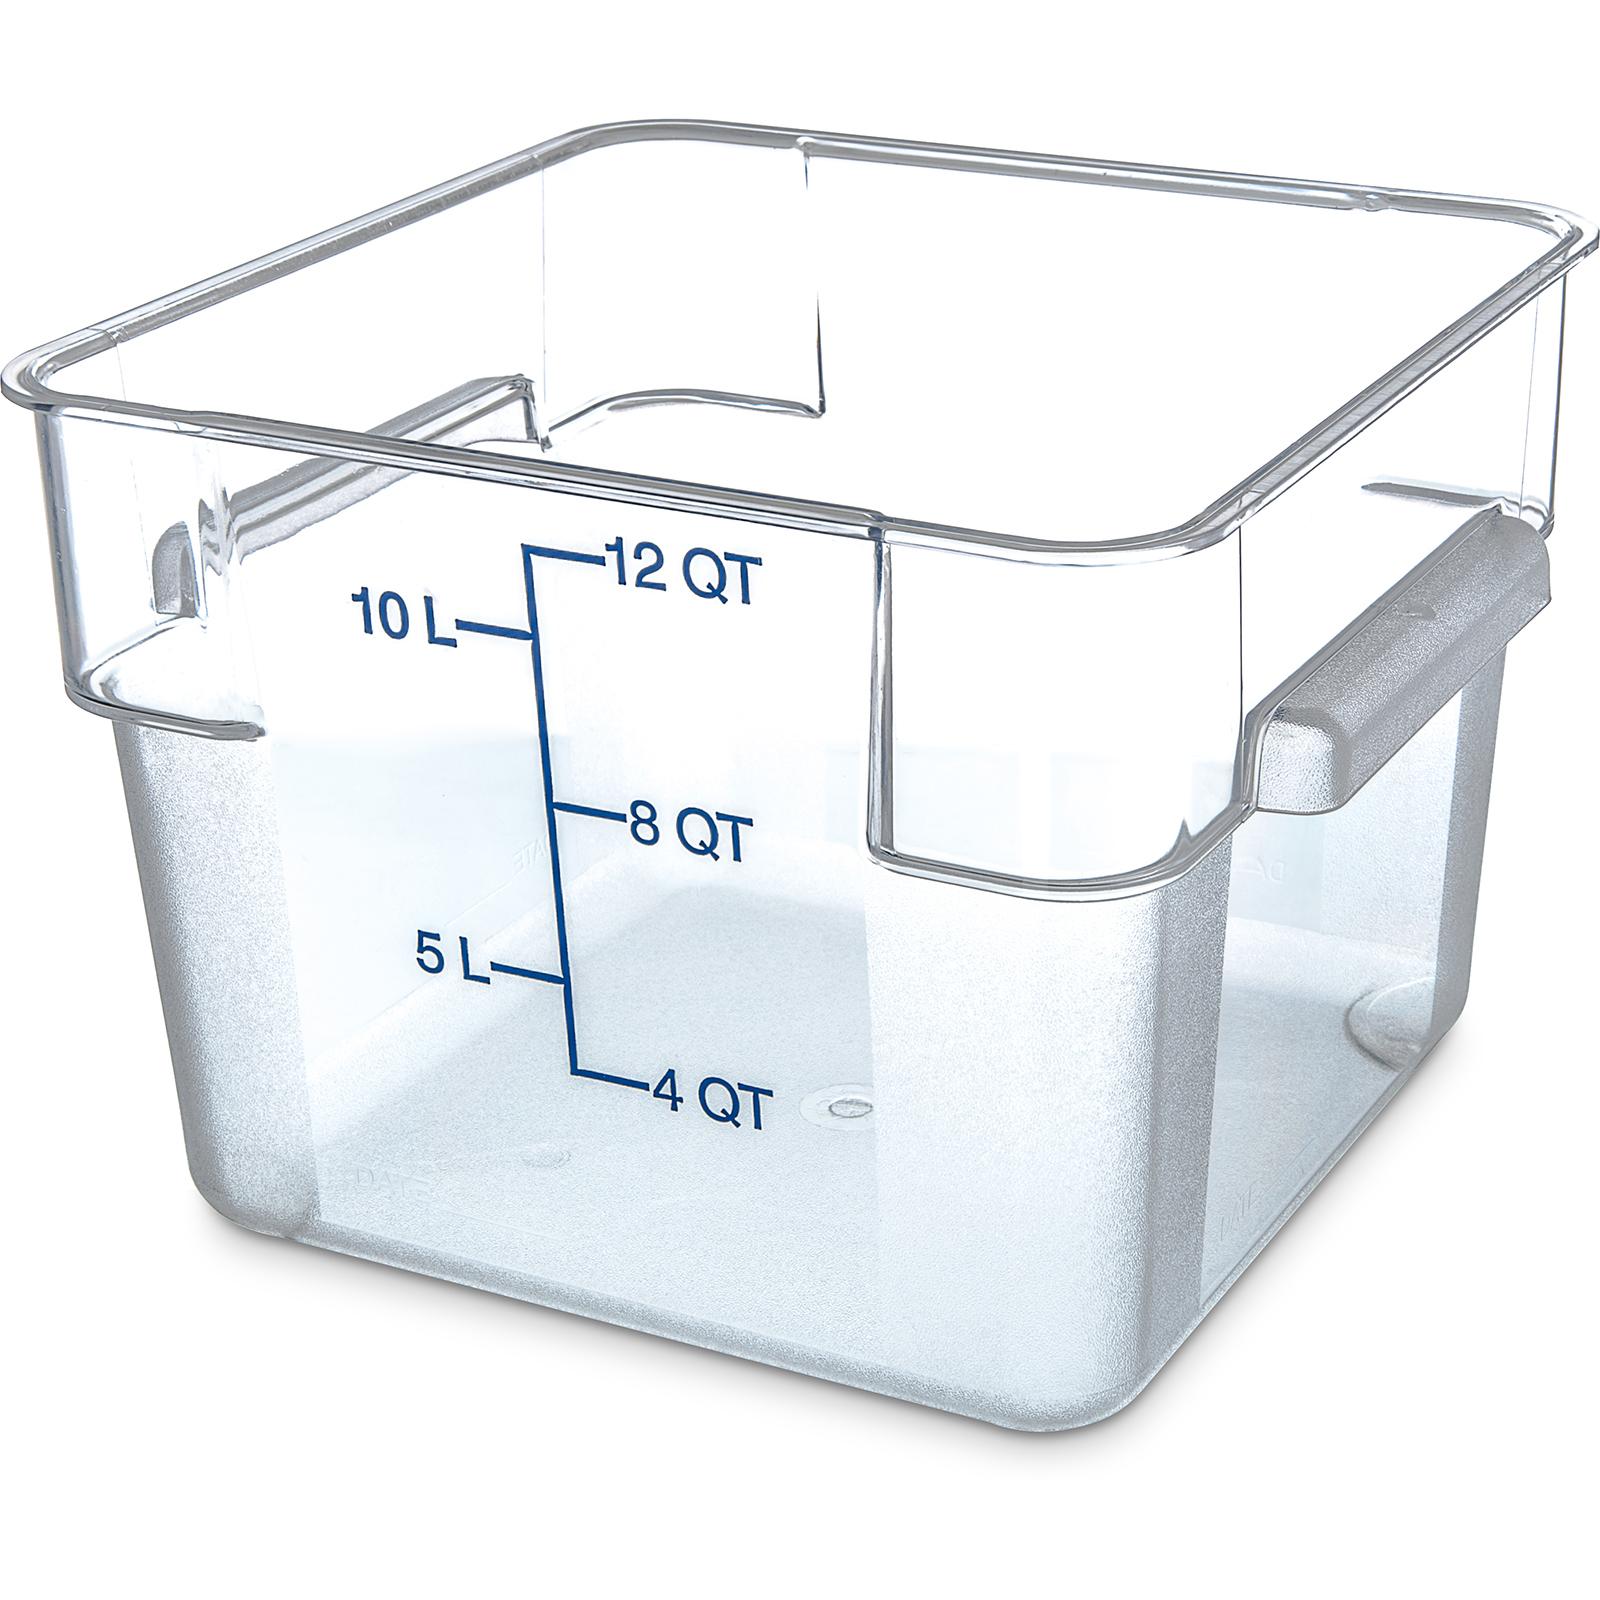 Carlisle 1072407 StorPlus™ Food Storage Container